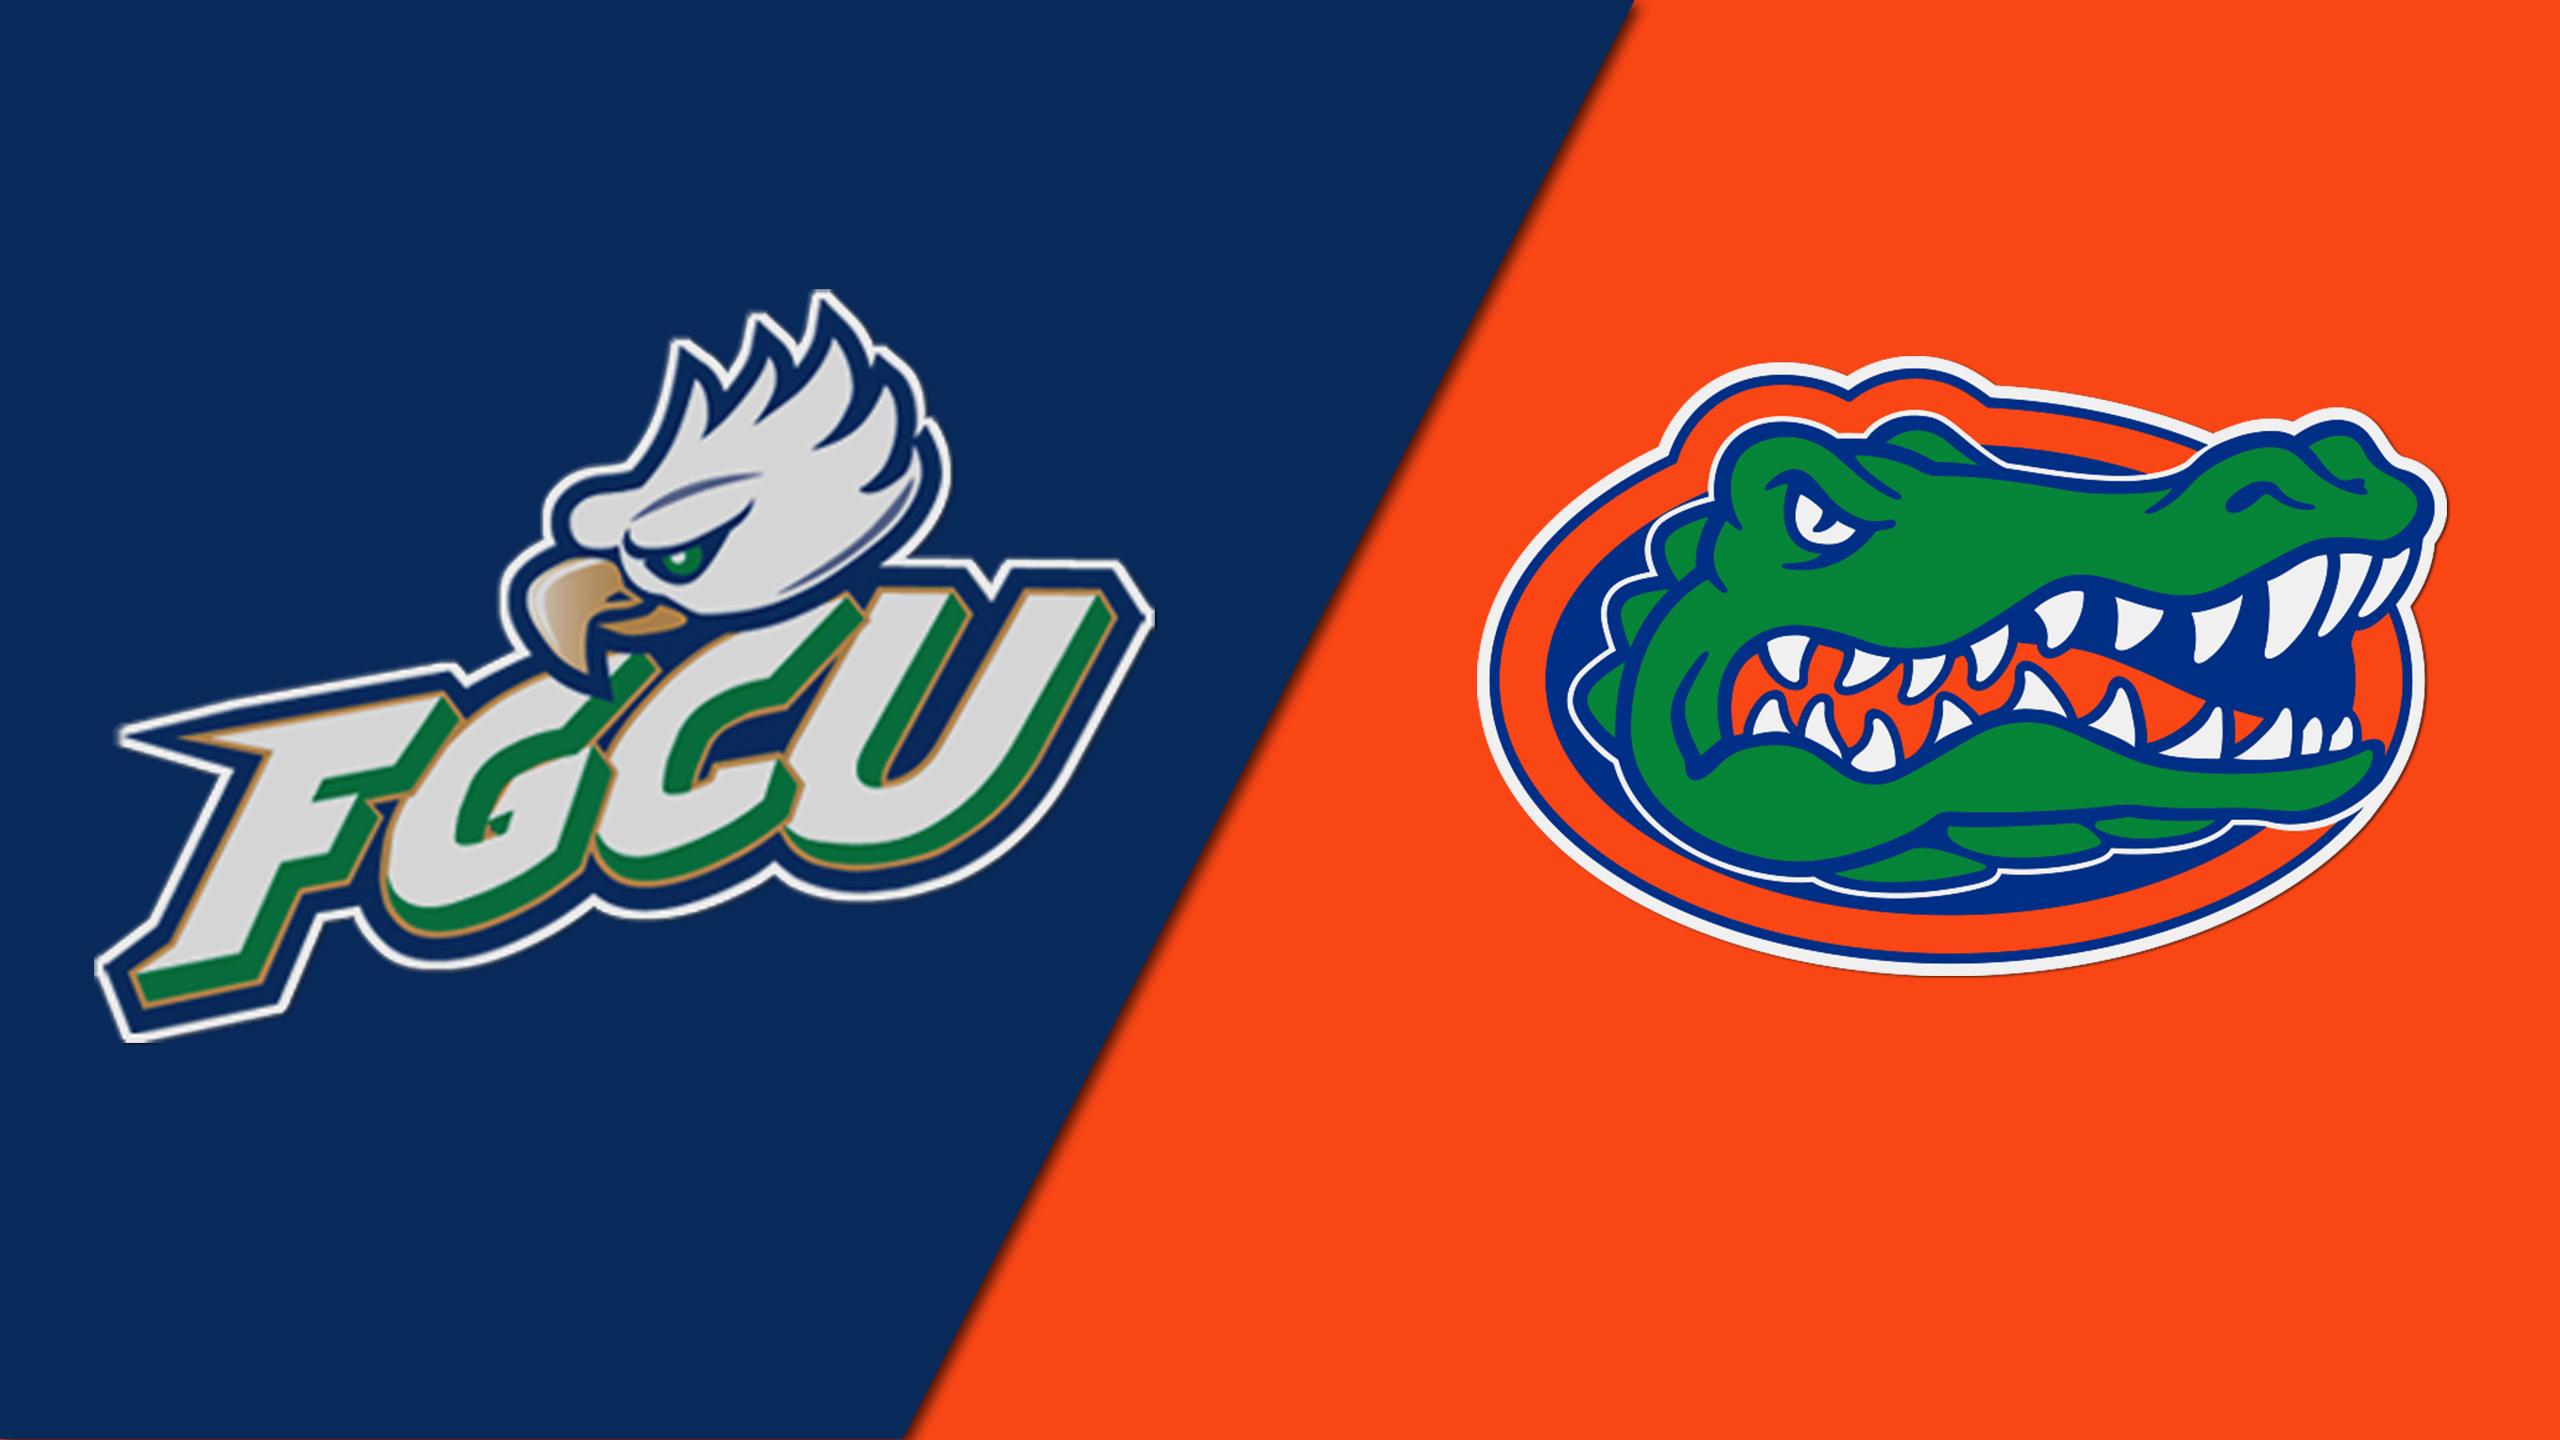 Florida Gulf Coast vs. Florida (Baseball)